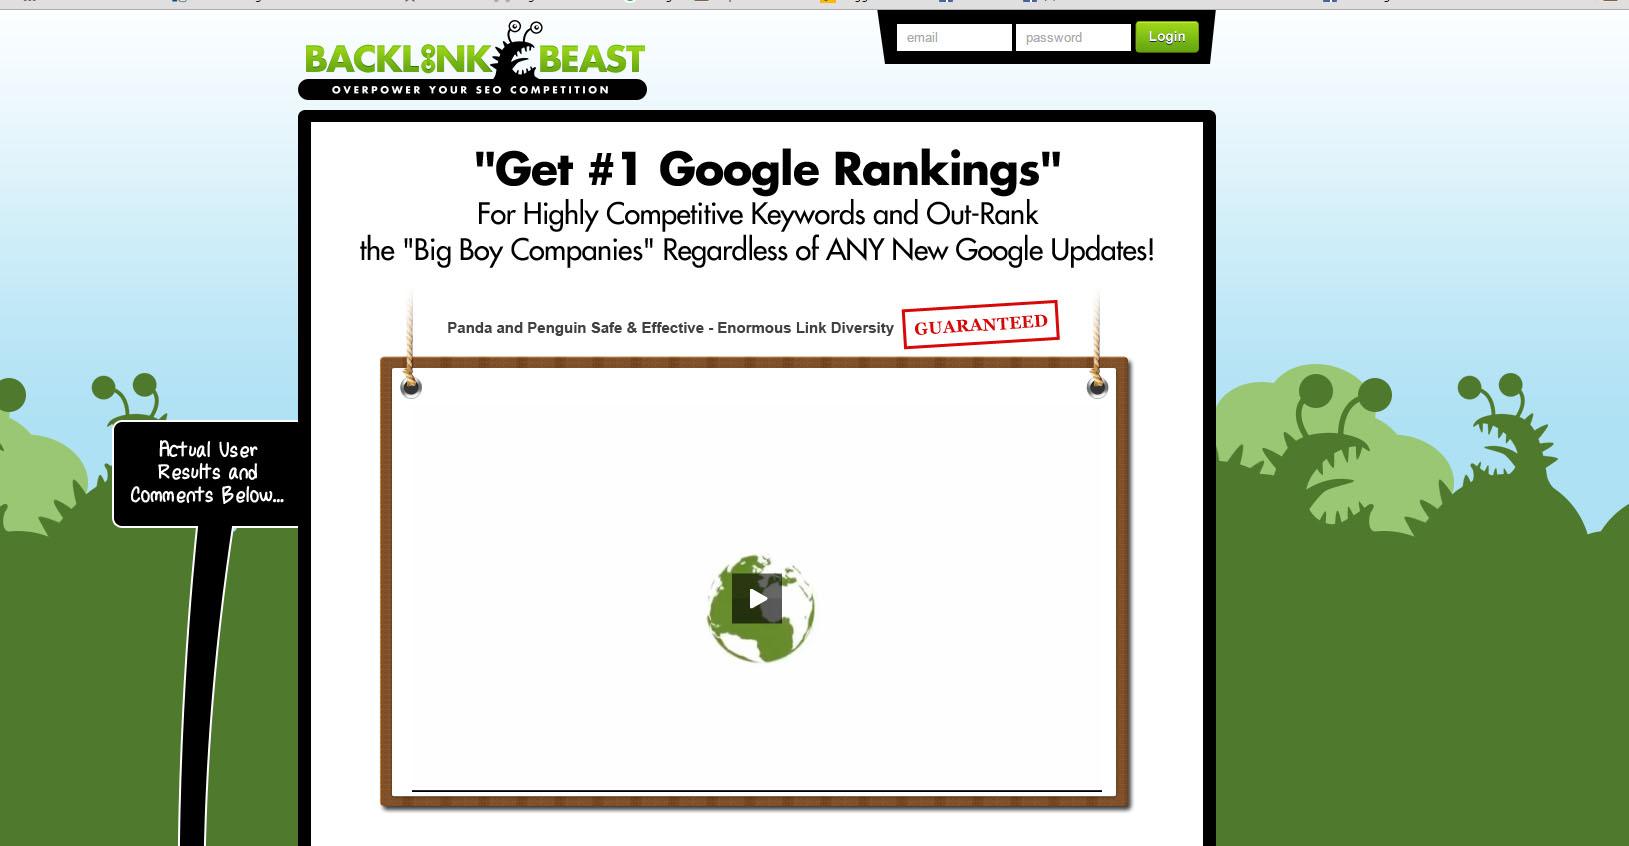 Best SEO softwere for SEO expert Backlink beast